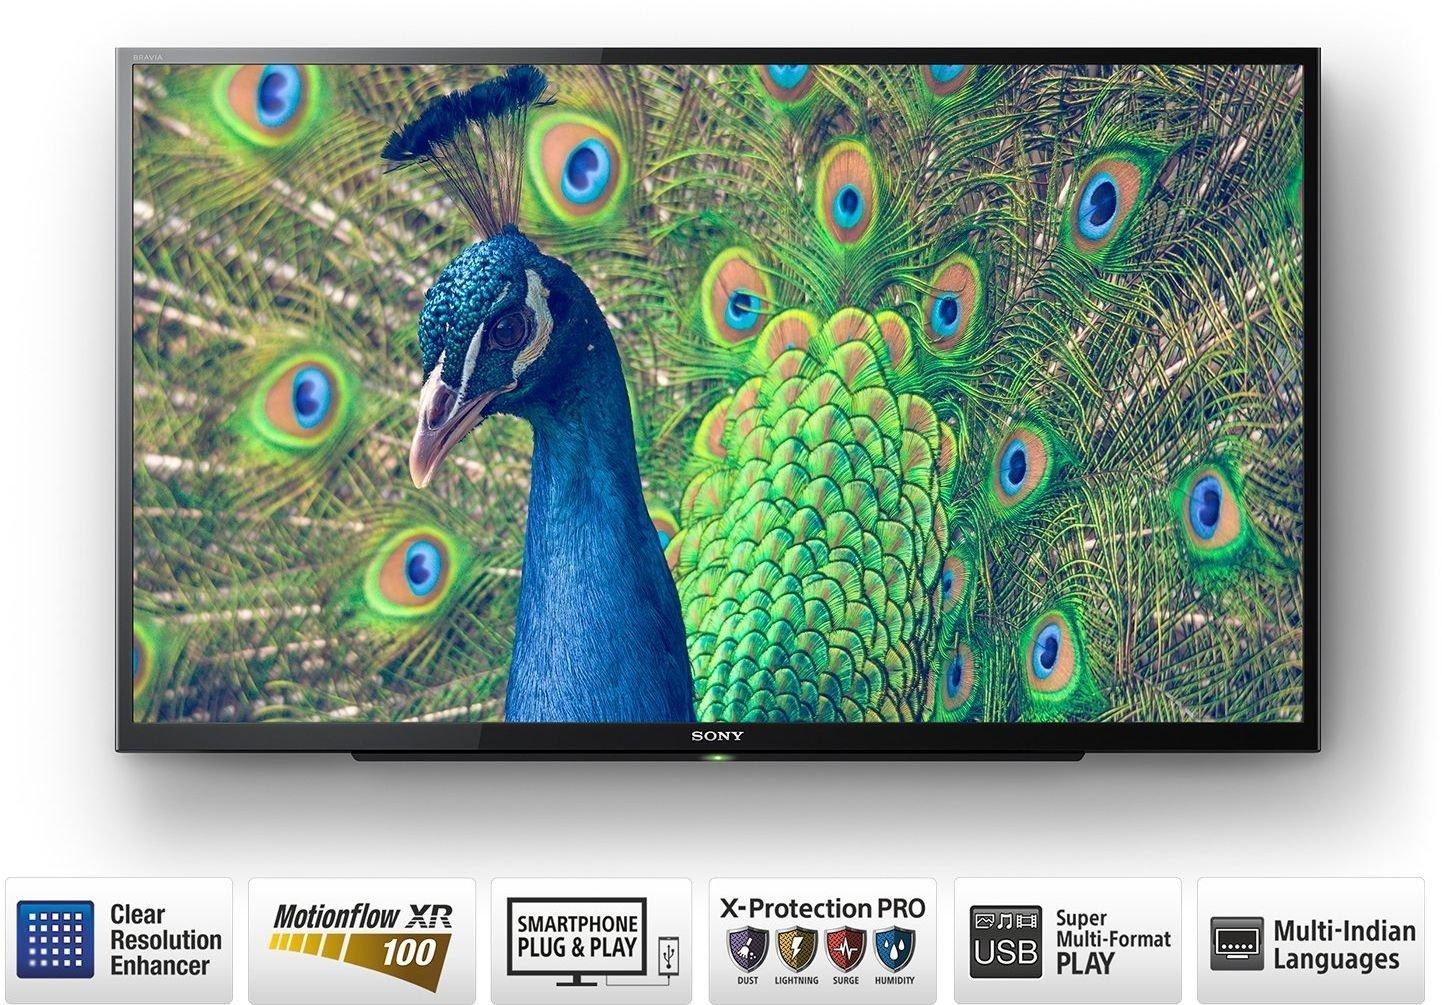 Sony Bravia 80 cm (32 Inches) HD Ready LED TV KLV-32R302E (Black) (2017  model)